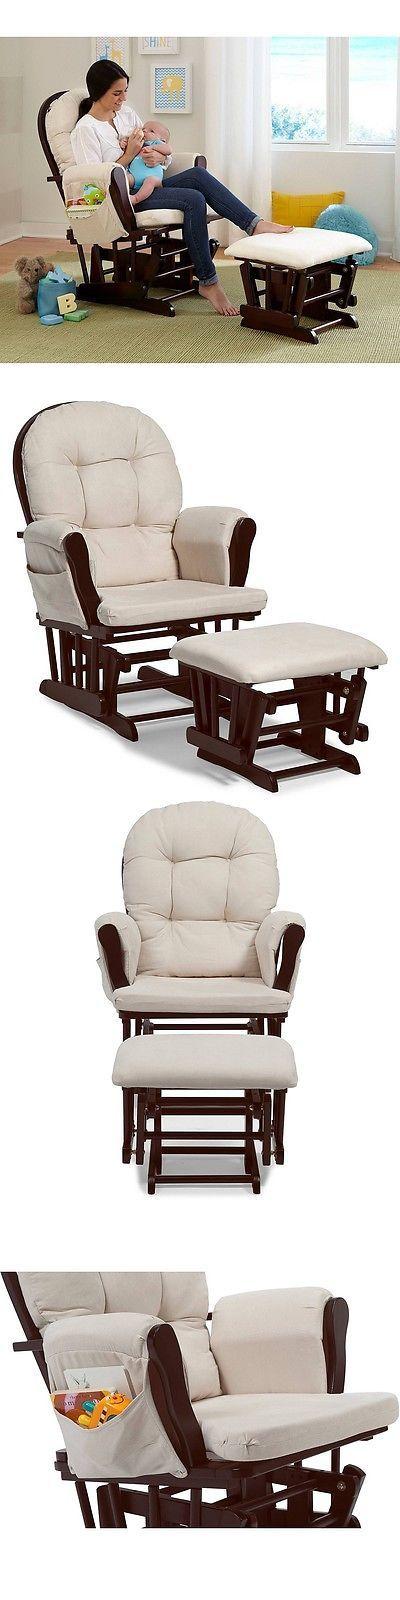 Baby Nursery: Glider Rocker Ottoman Set Chair Baby Furniture Rocking Nursing Seat Wood Cushion BUY IT NOW ONLY: $166.85